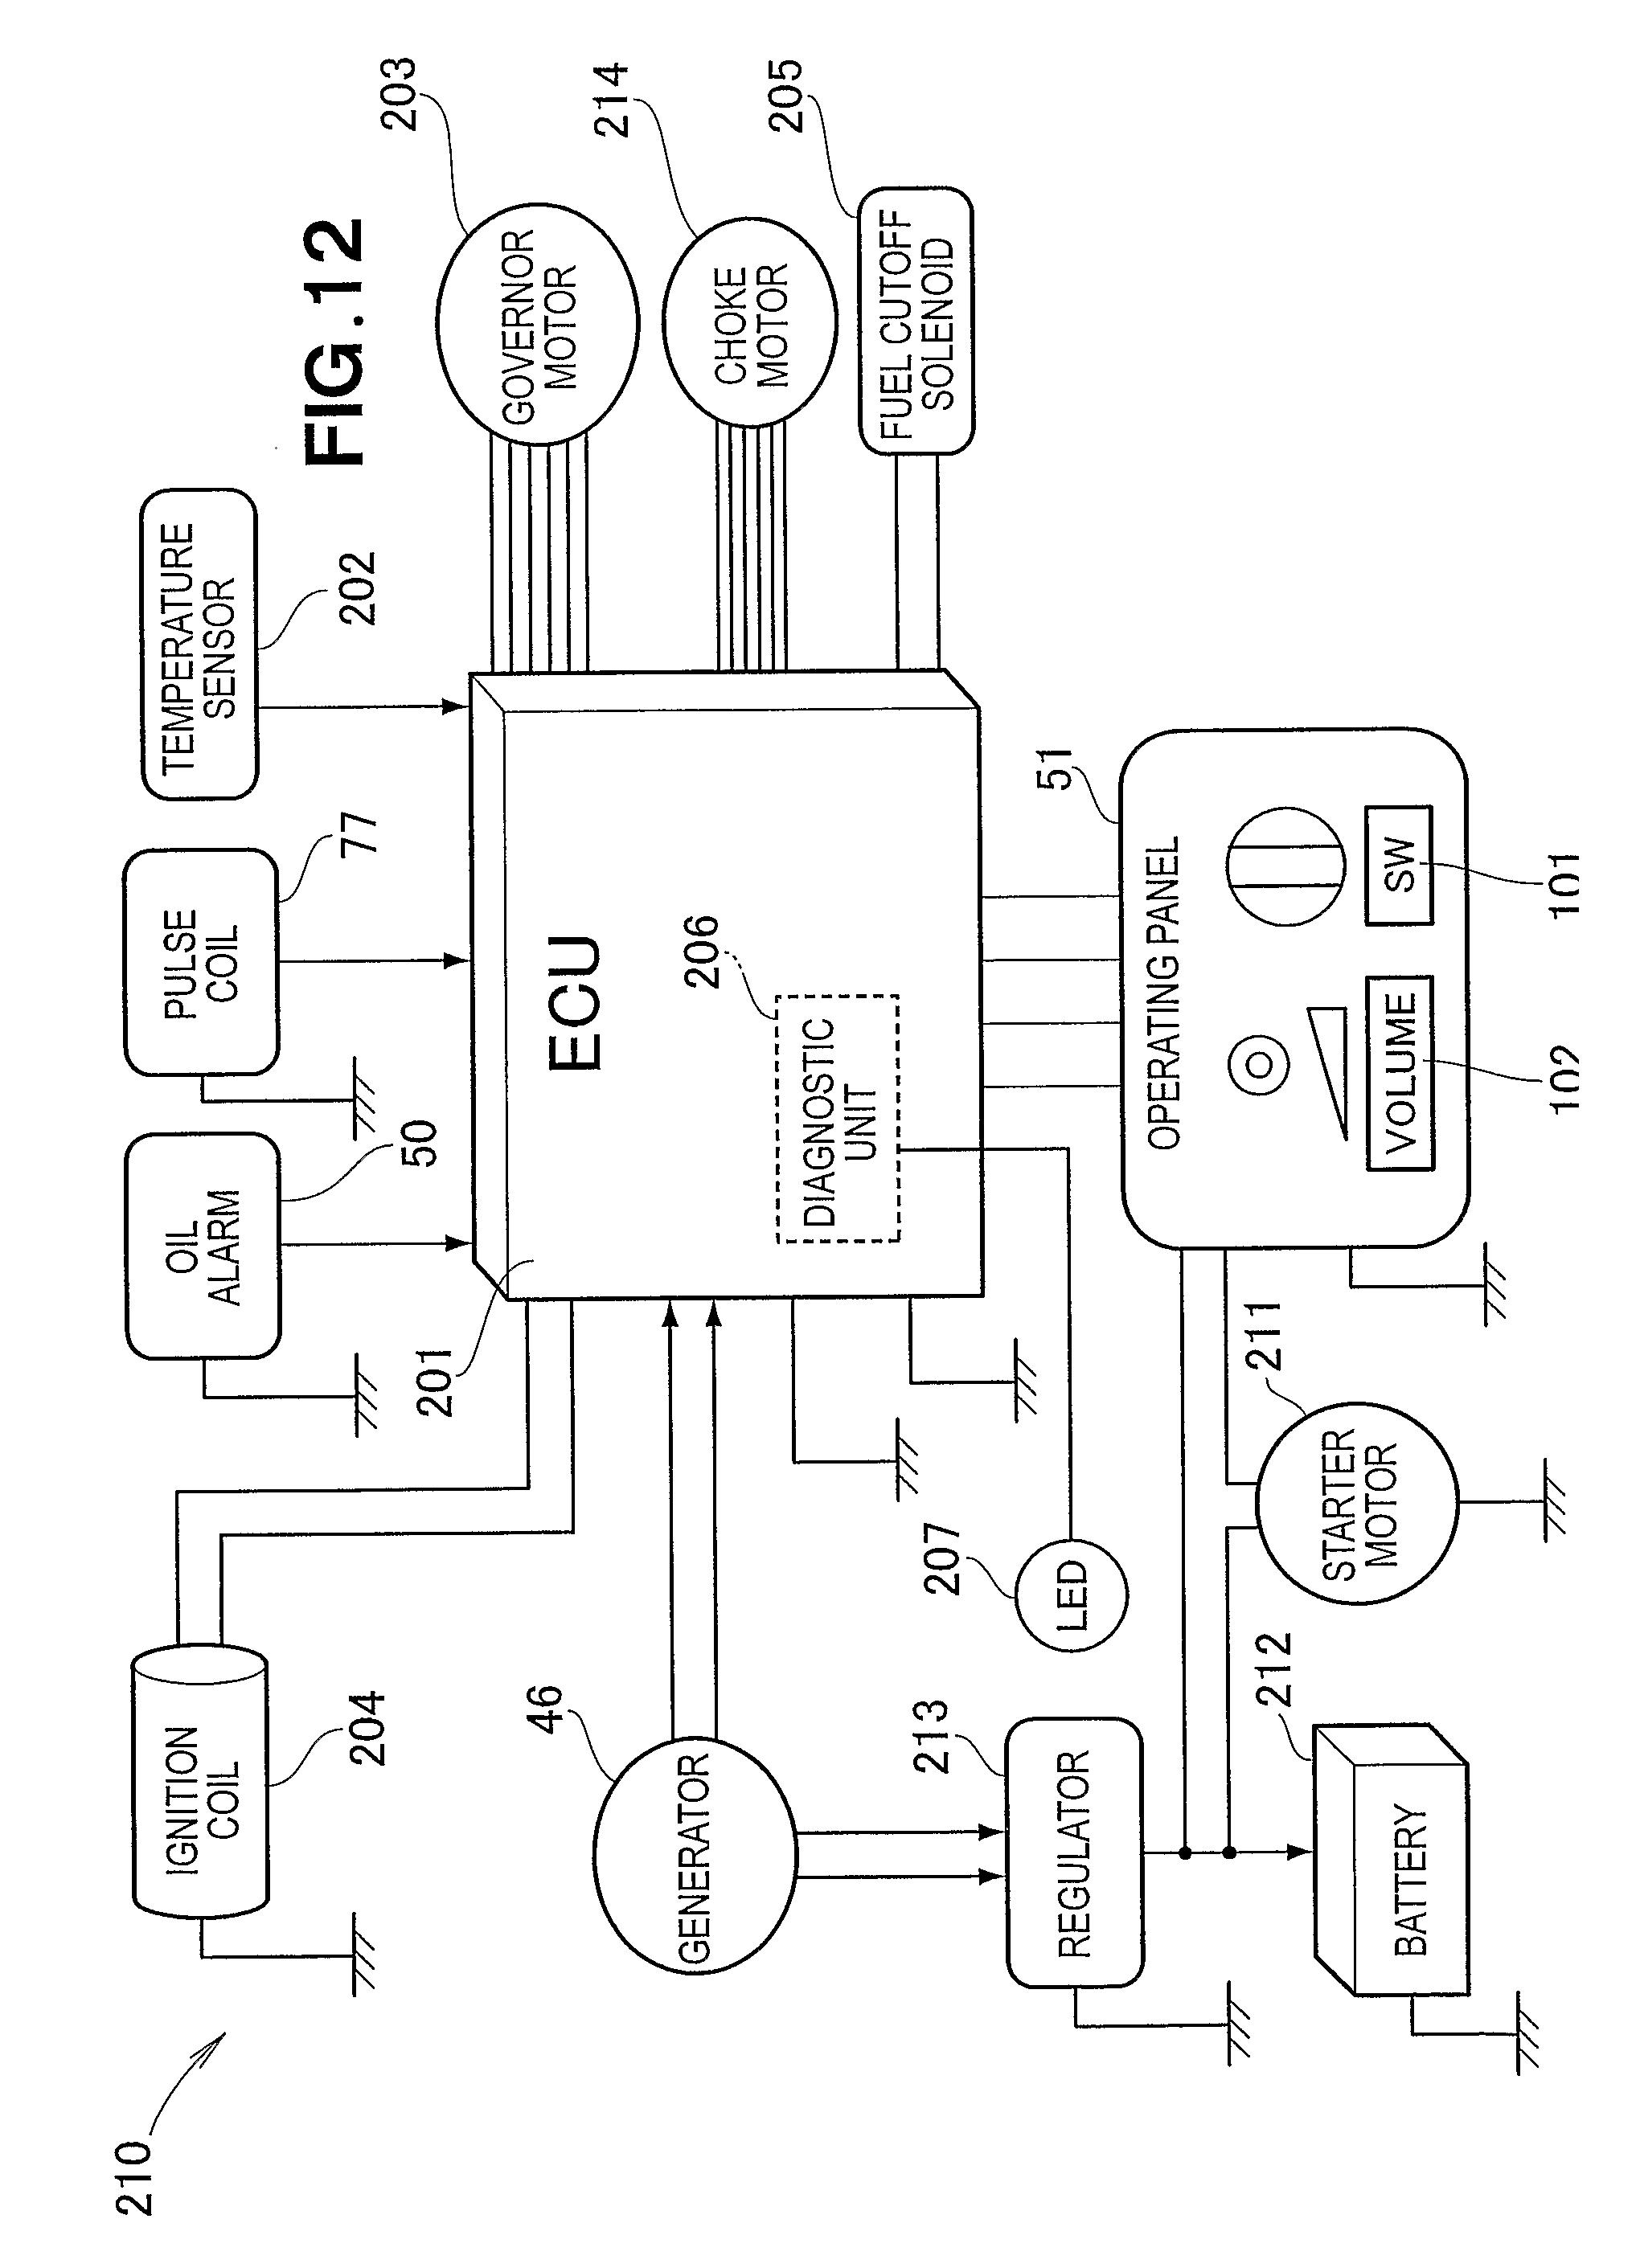 Optek Fretlight Fg 200 Wiring Diagram